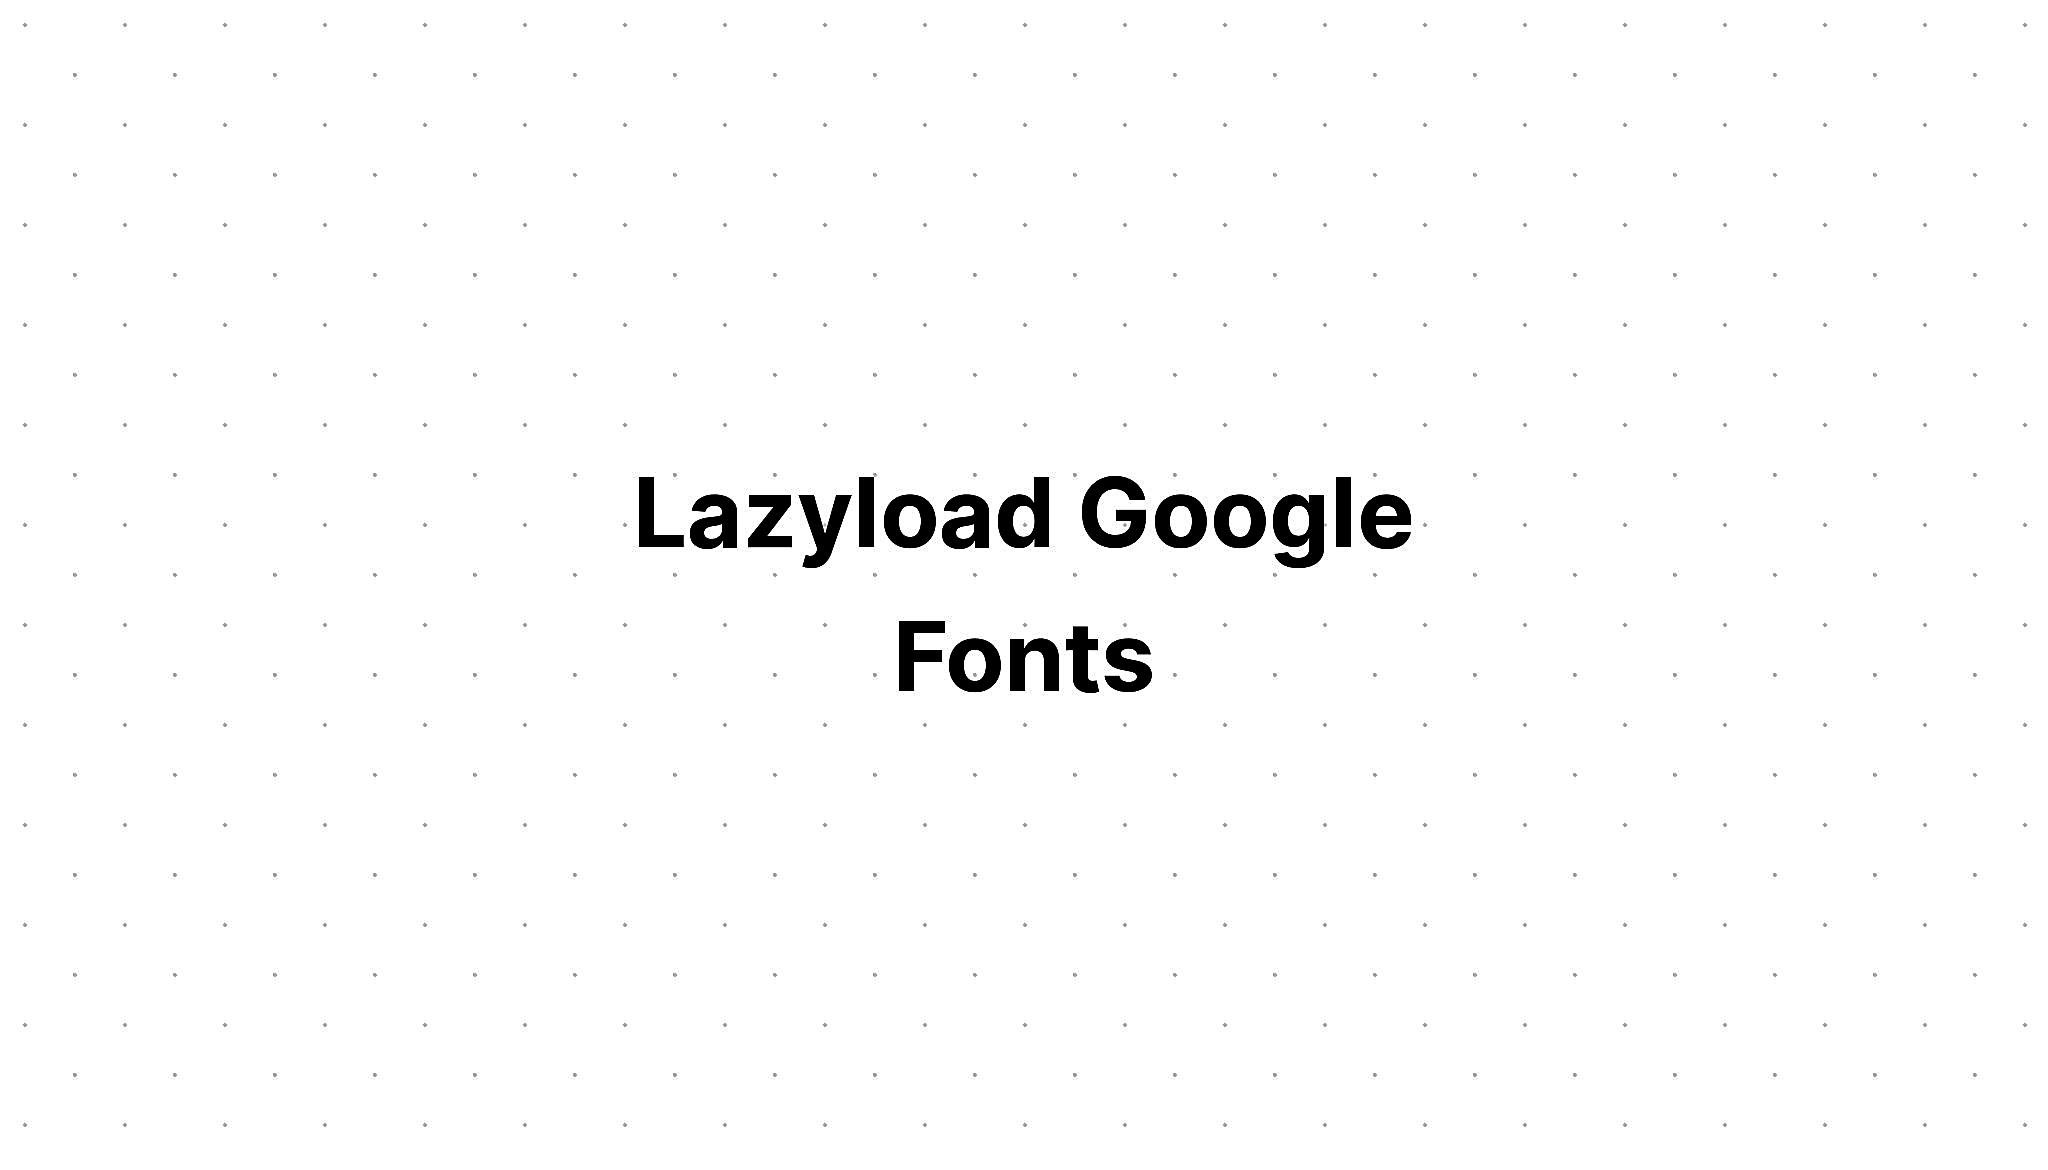 Lazyload Google Fonts